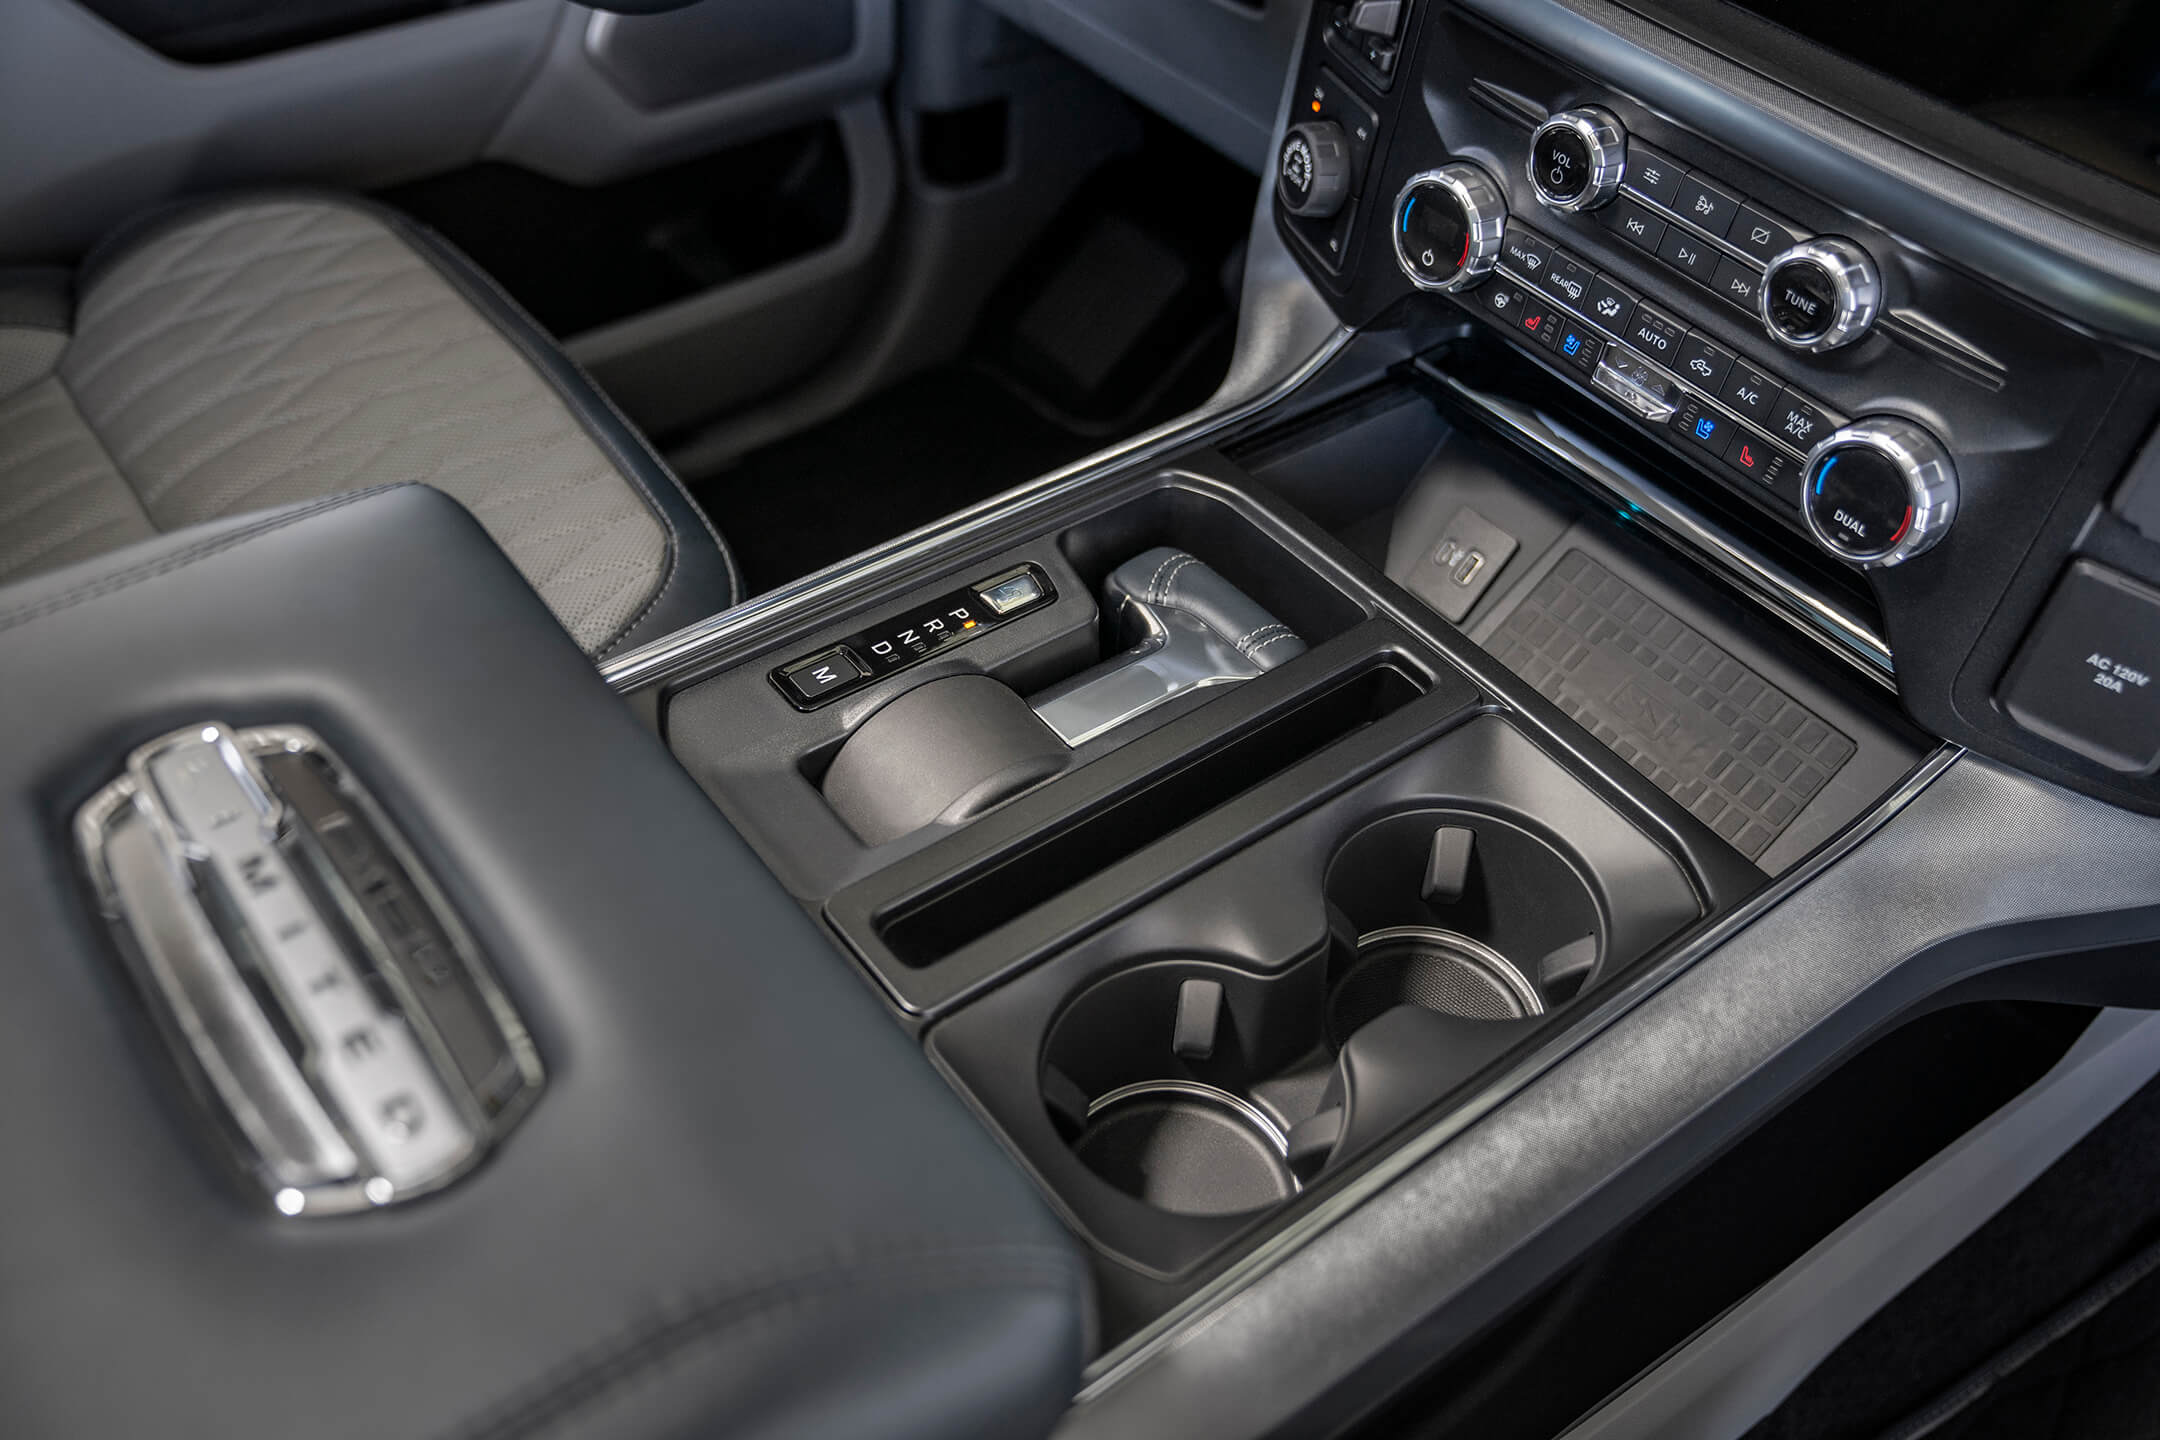 ford f150 interior display